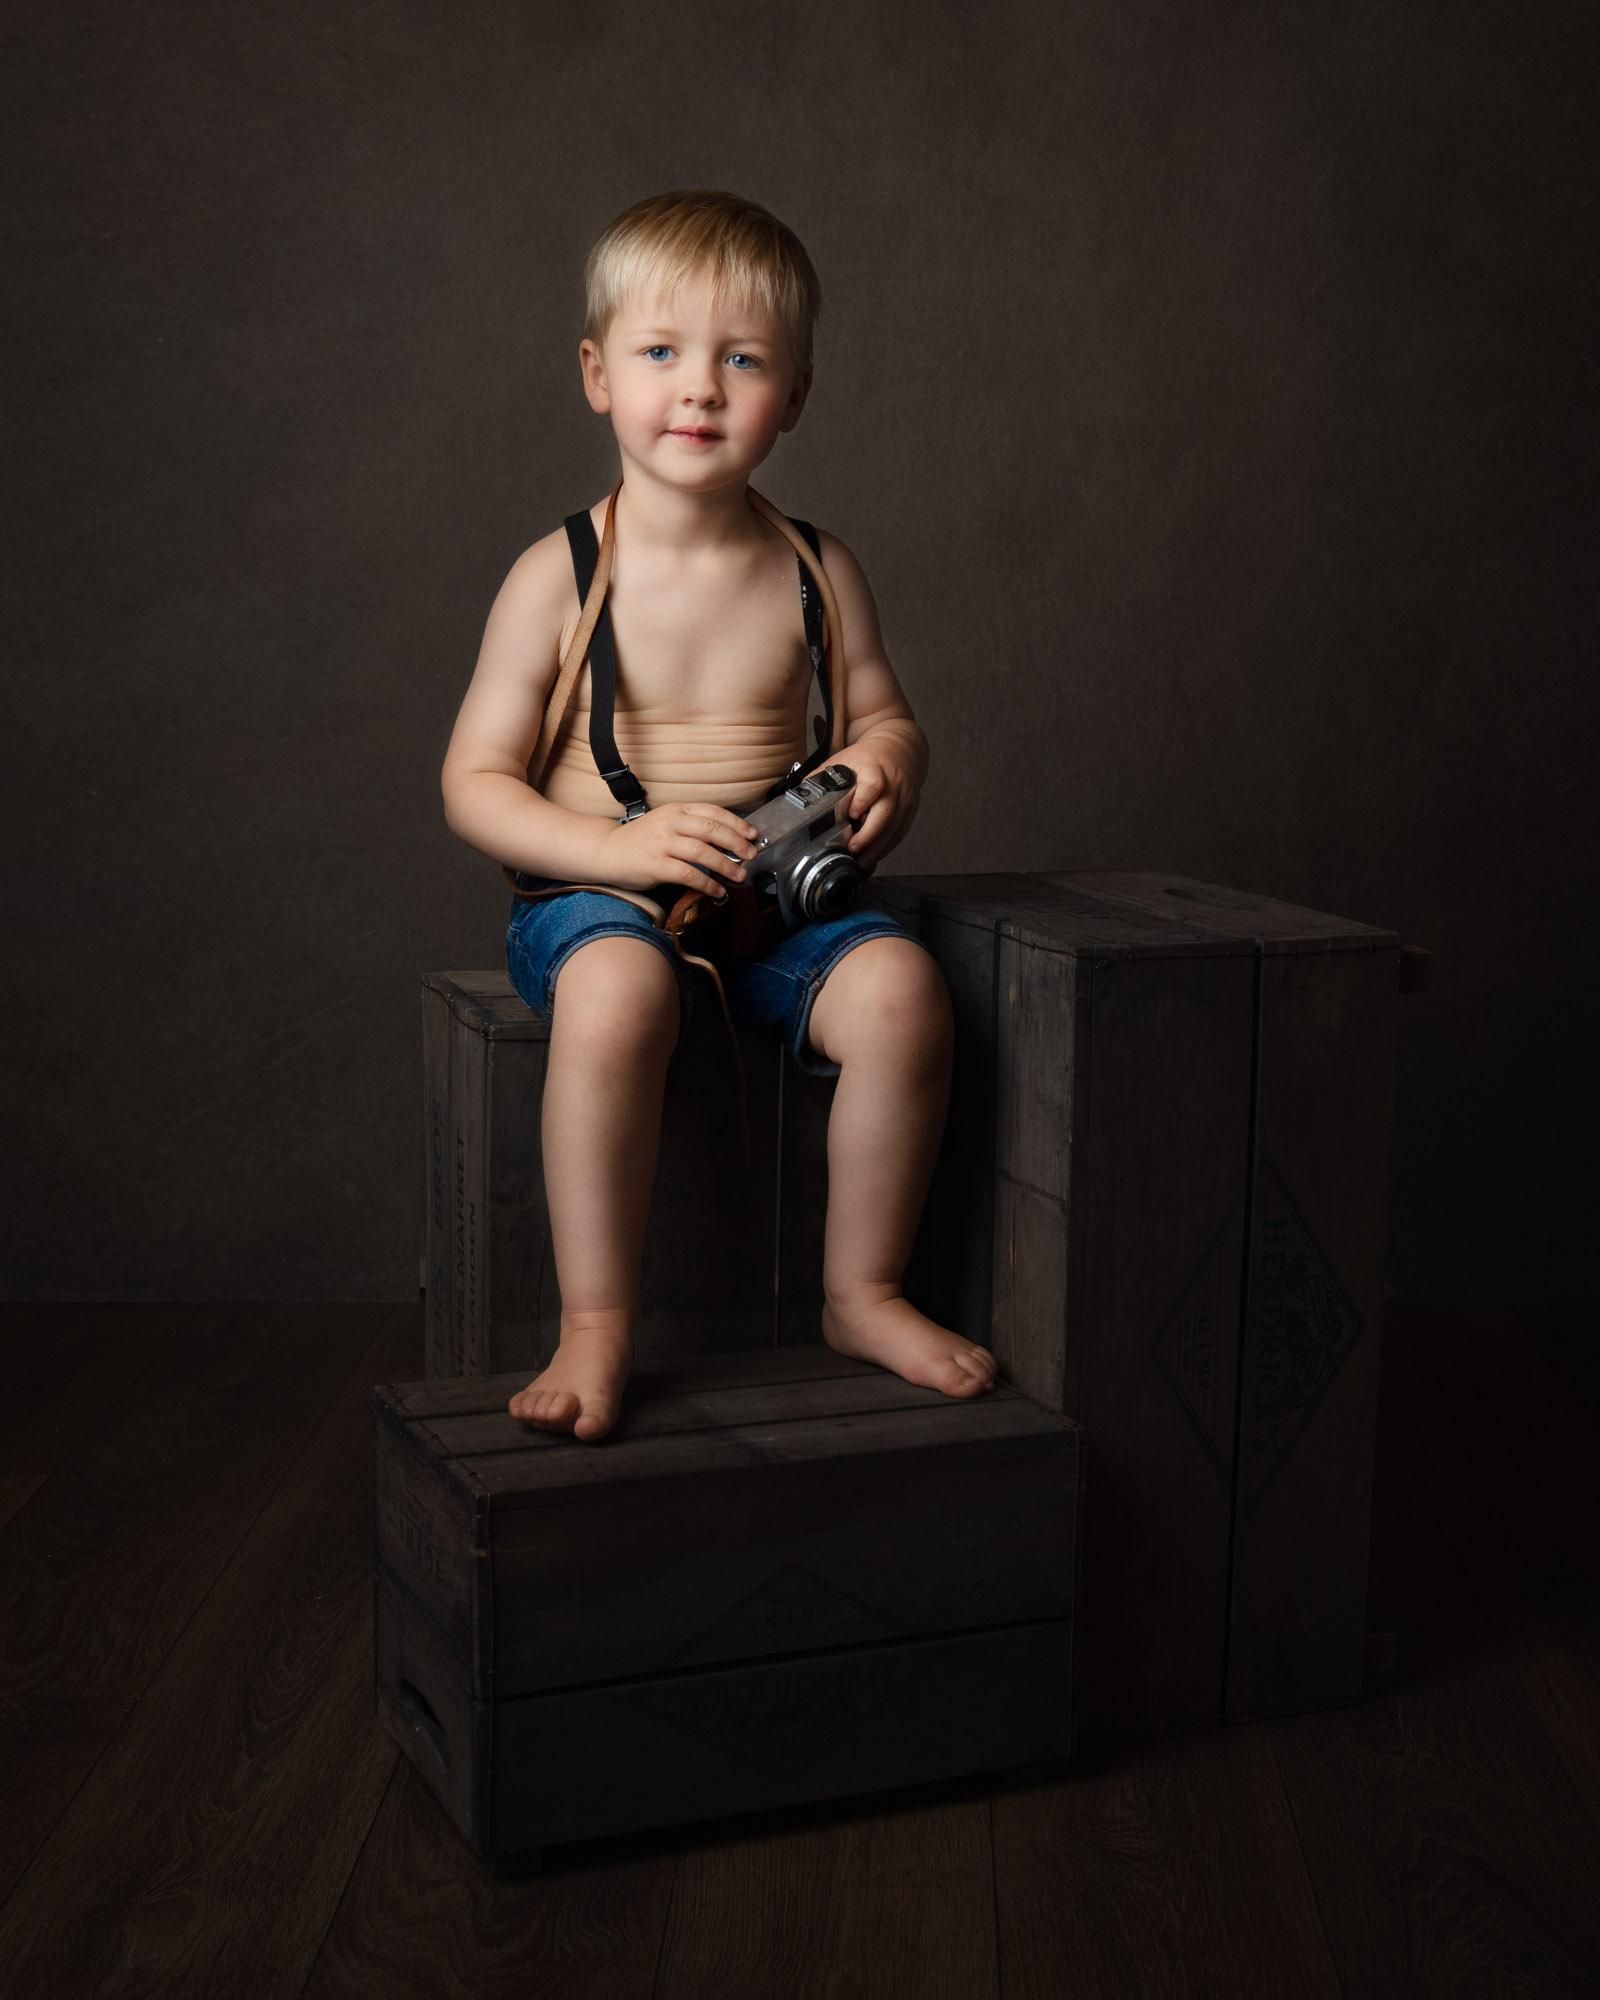 lisa-scott-photography-110